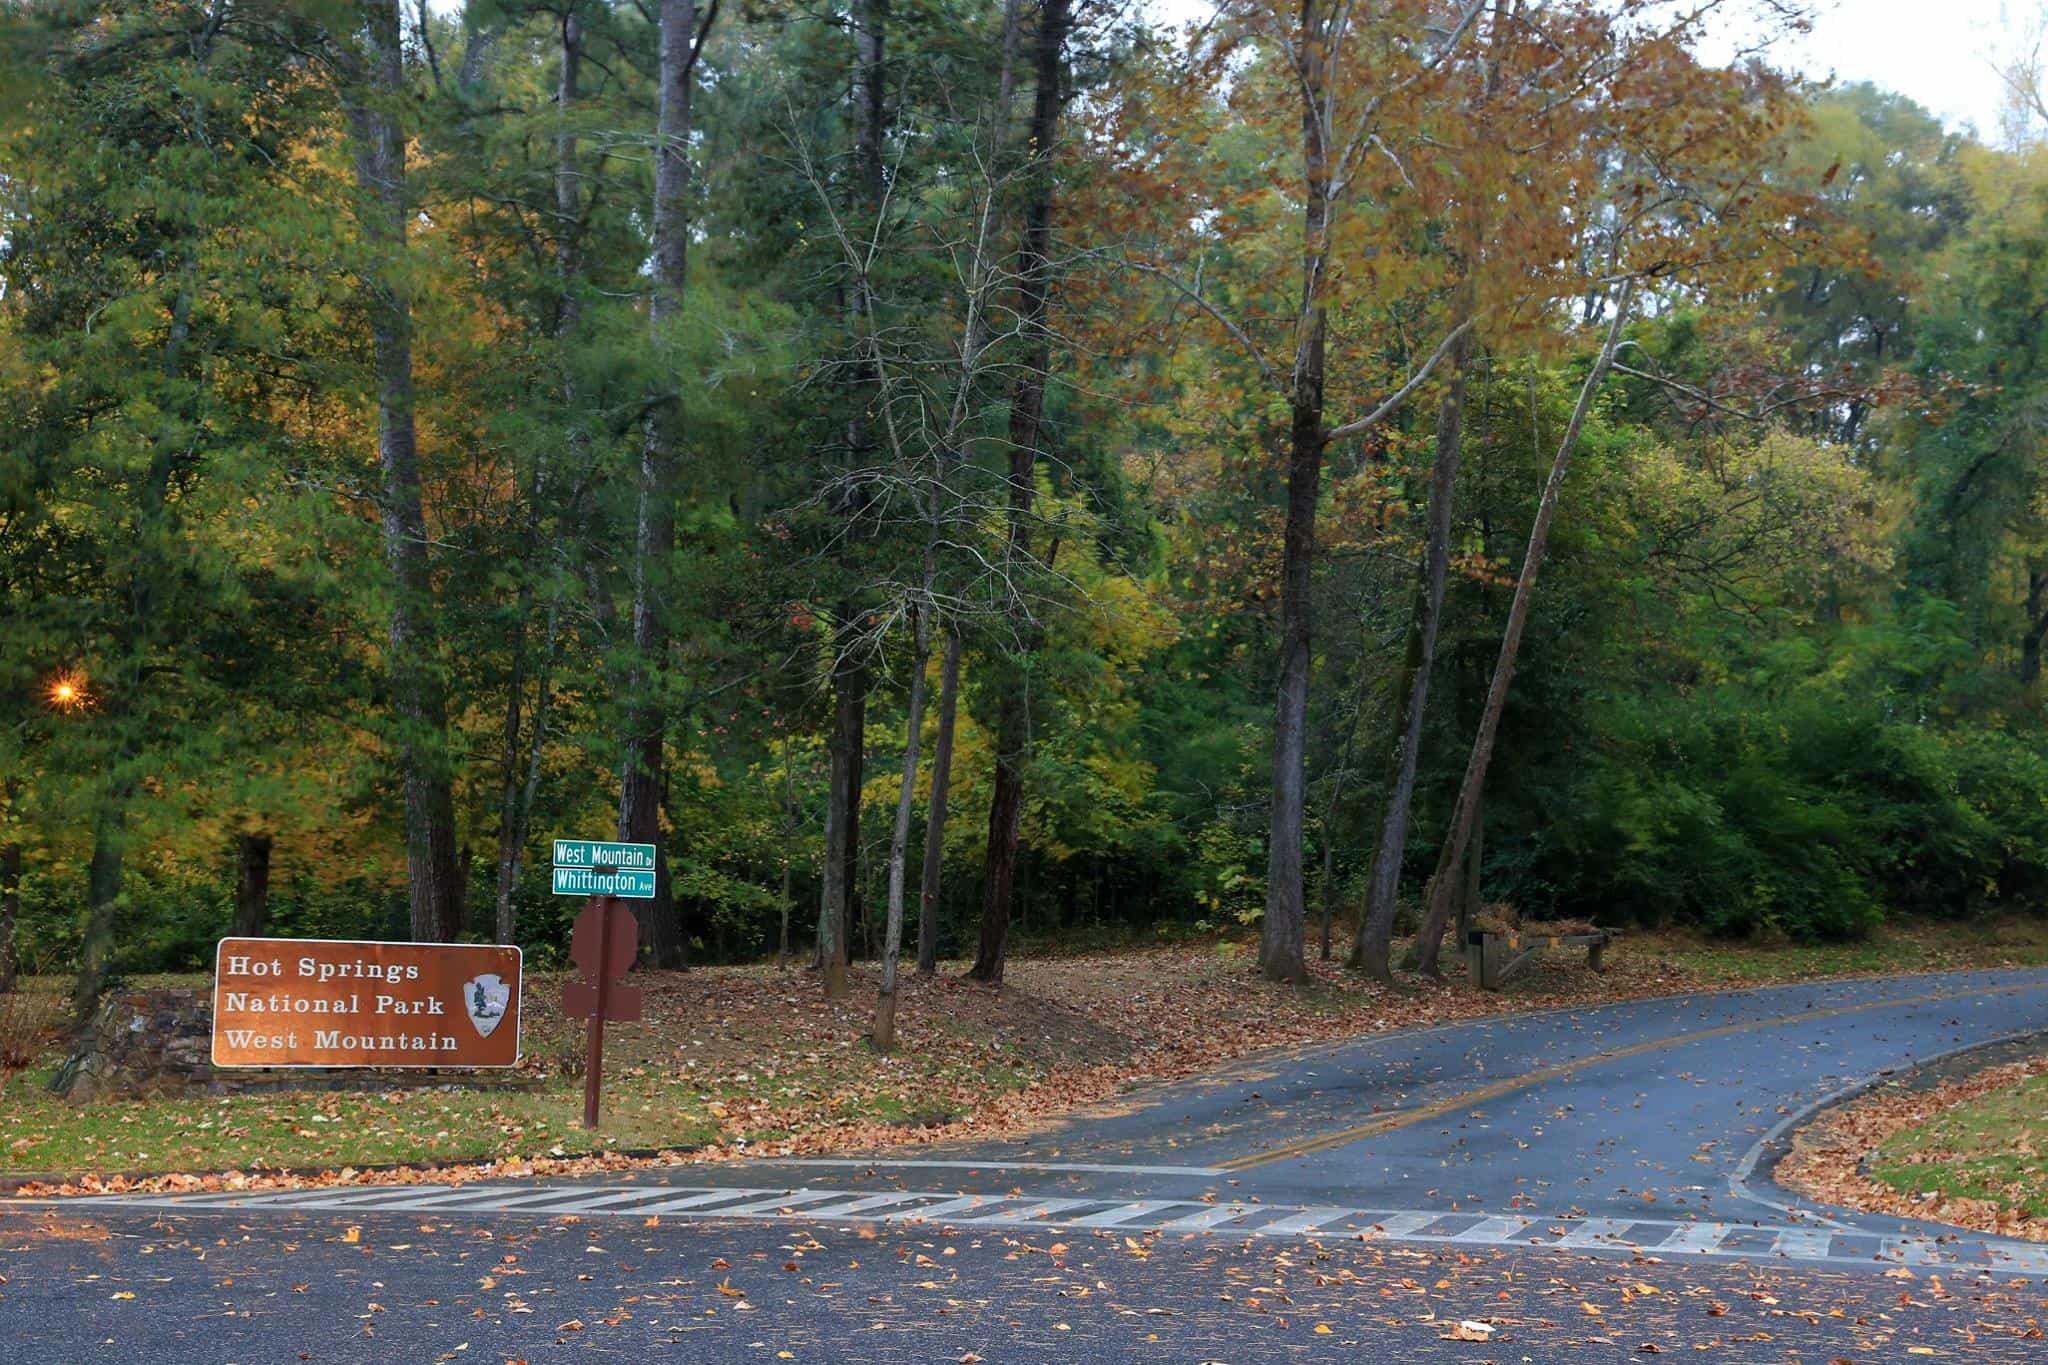 Spa 10K West Mountain Drive Entrance